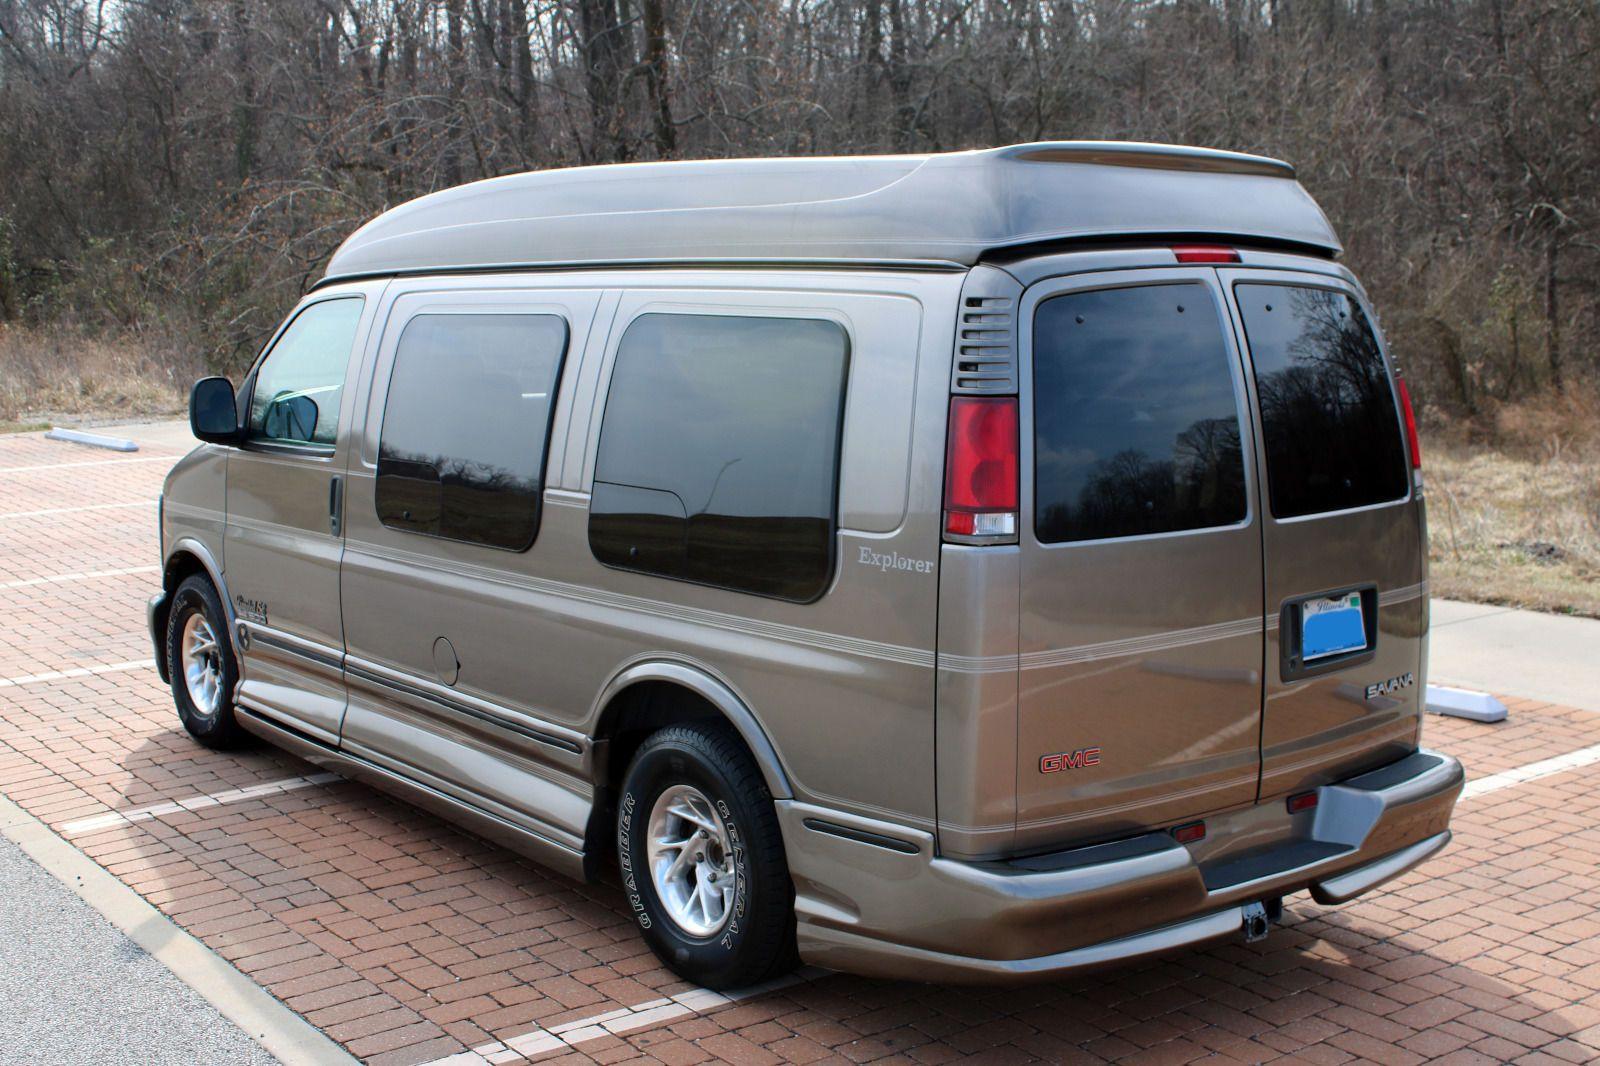 medium resolution of 2000 gmc savana explorer ebay chevrolet van chevy express custom vans gmc